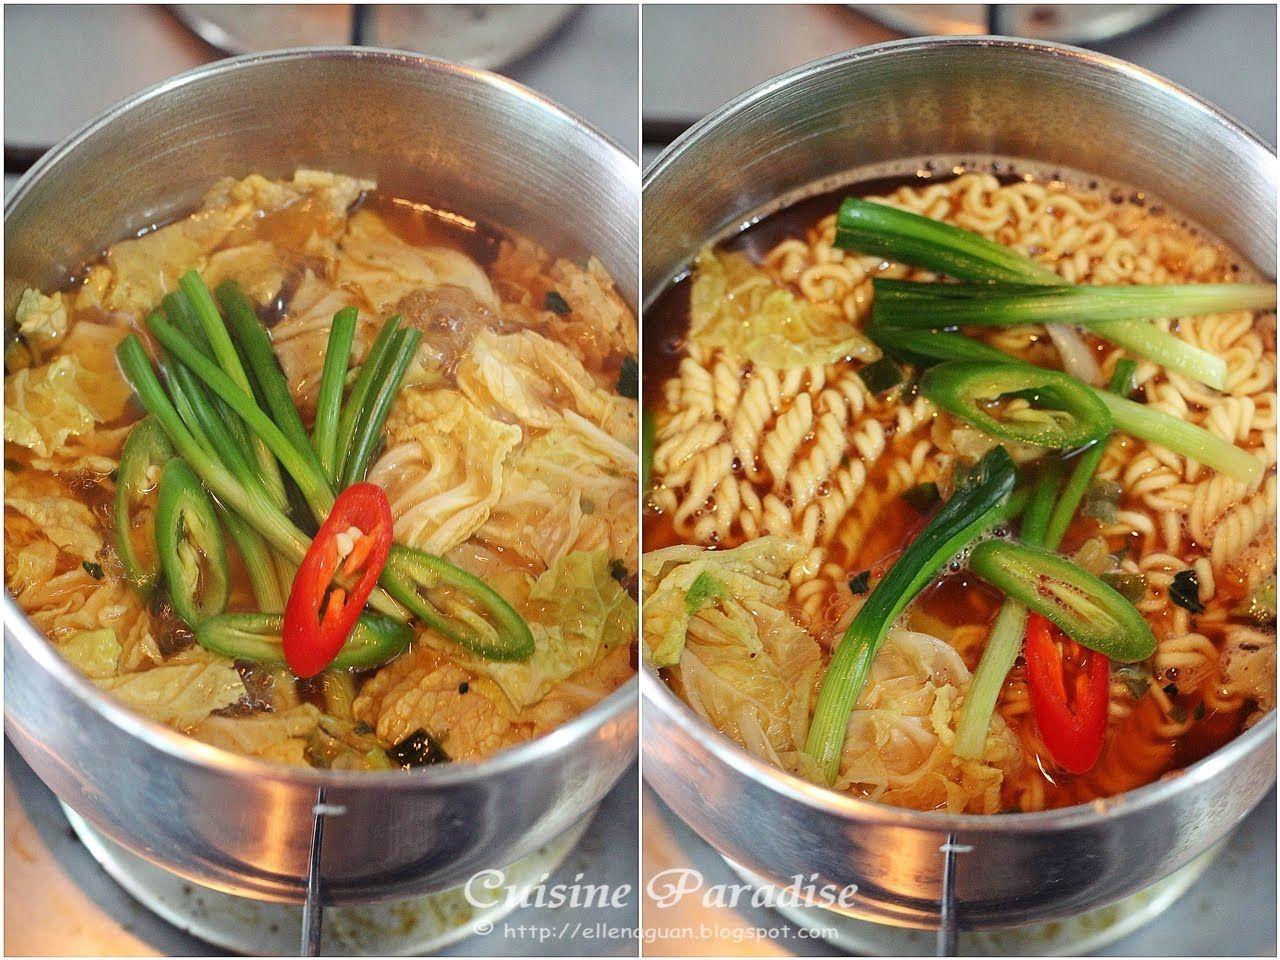 Korean recipes food blog recipes reviews and travel asian food recipes forumfinder Choice Image